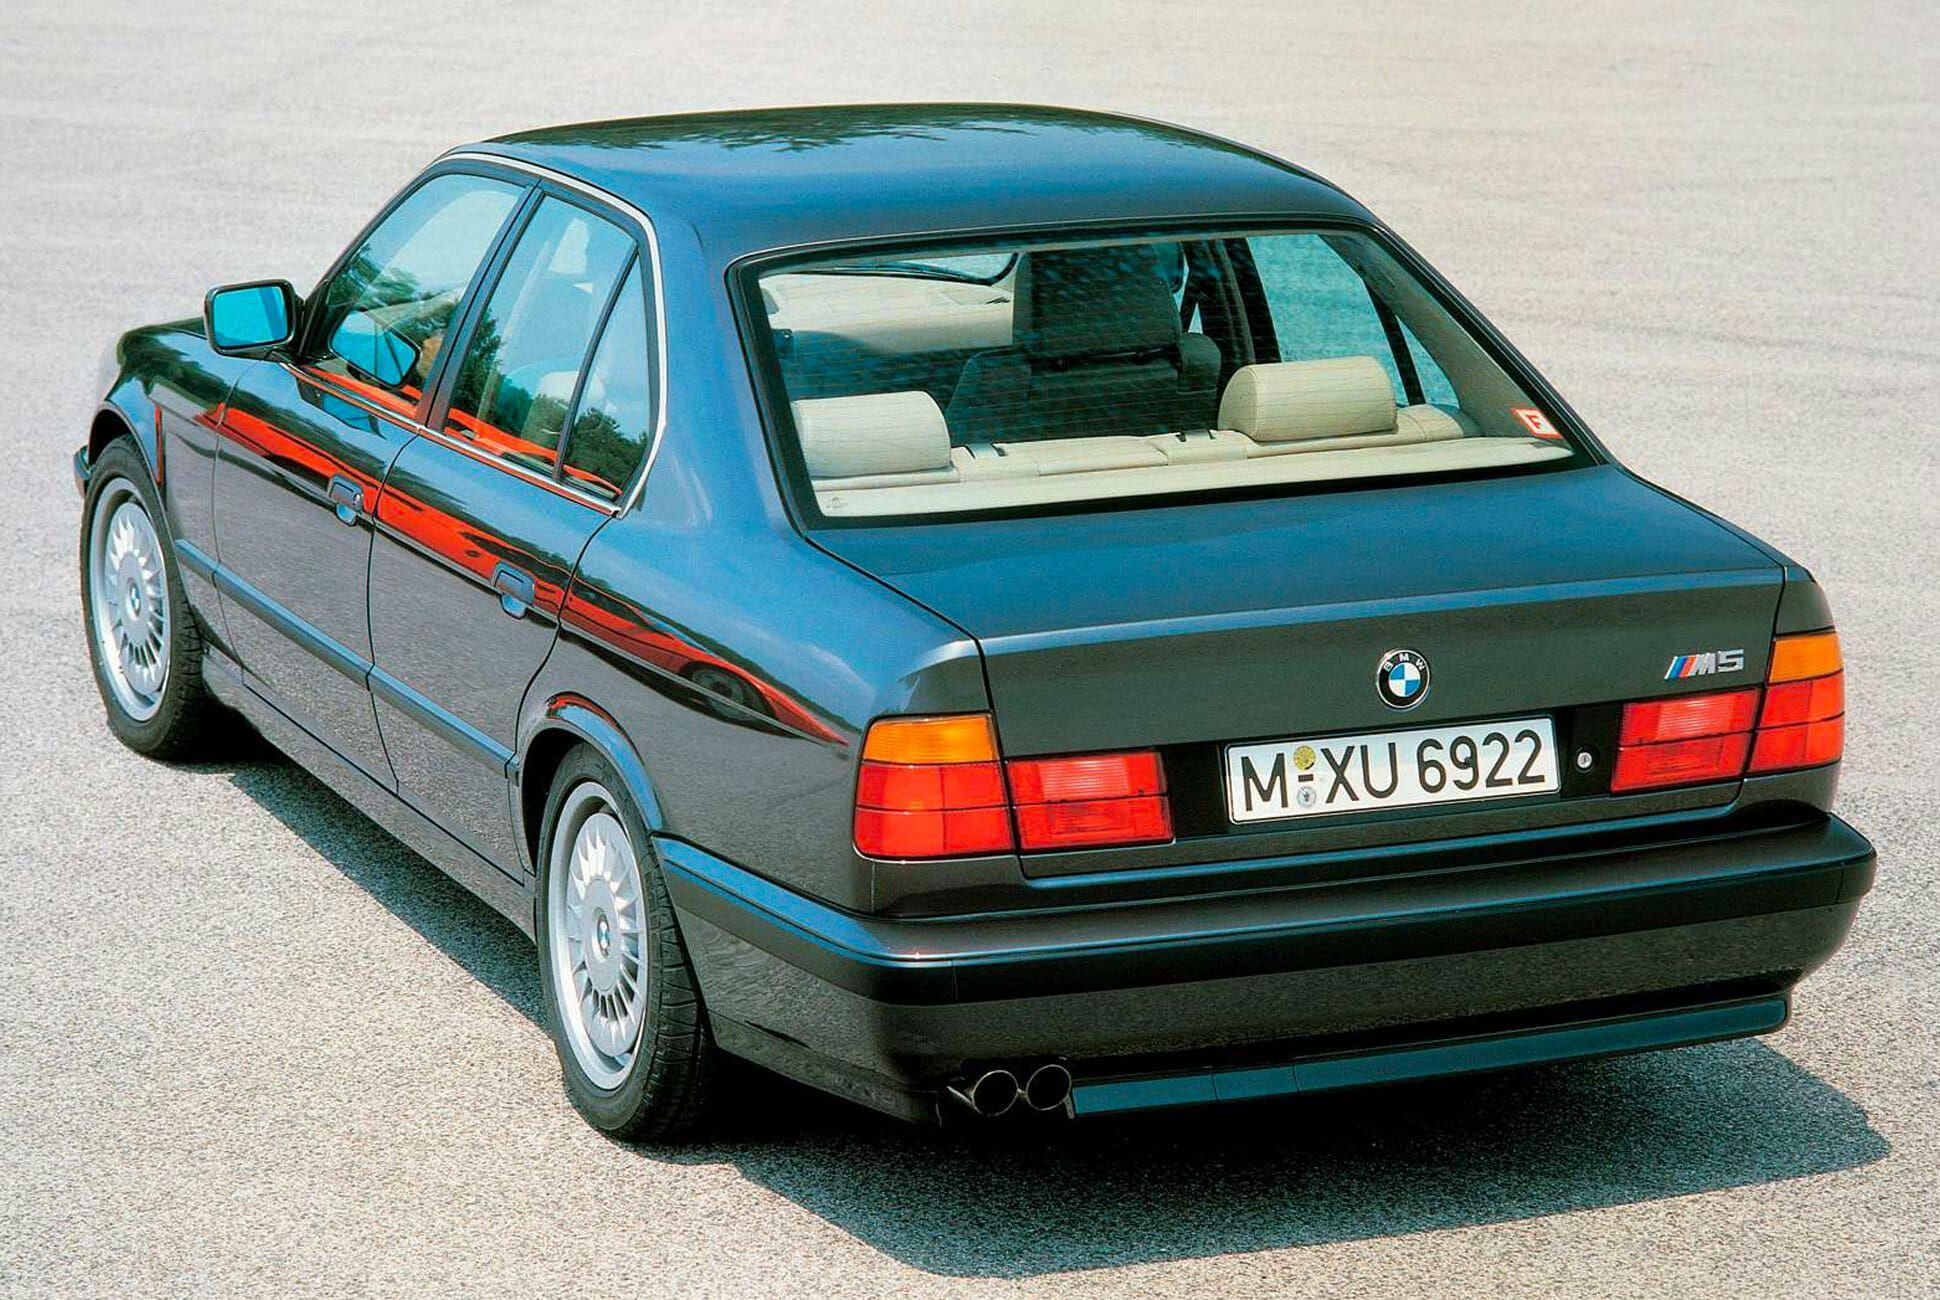 E34-BMW-M5-gear-patrol-slide-2